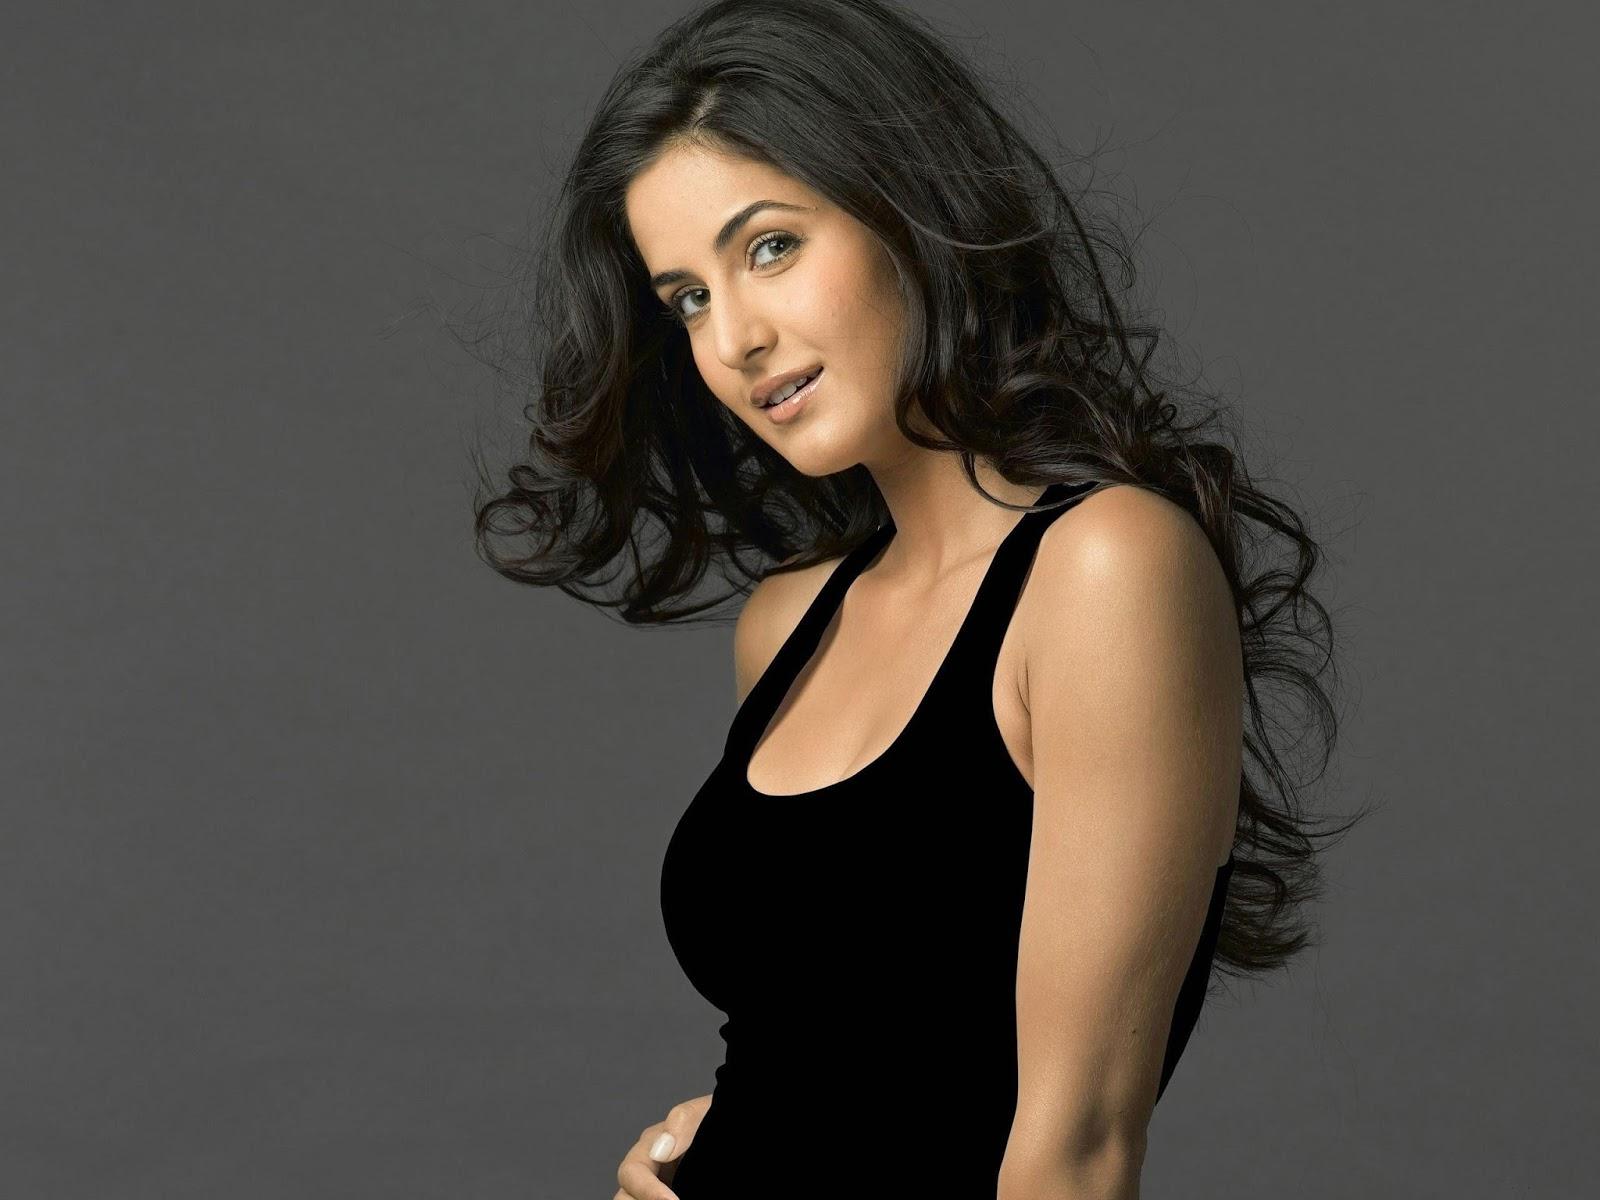 Katrina Kaif in Black Dress Image